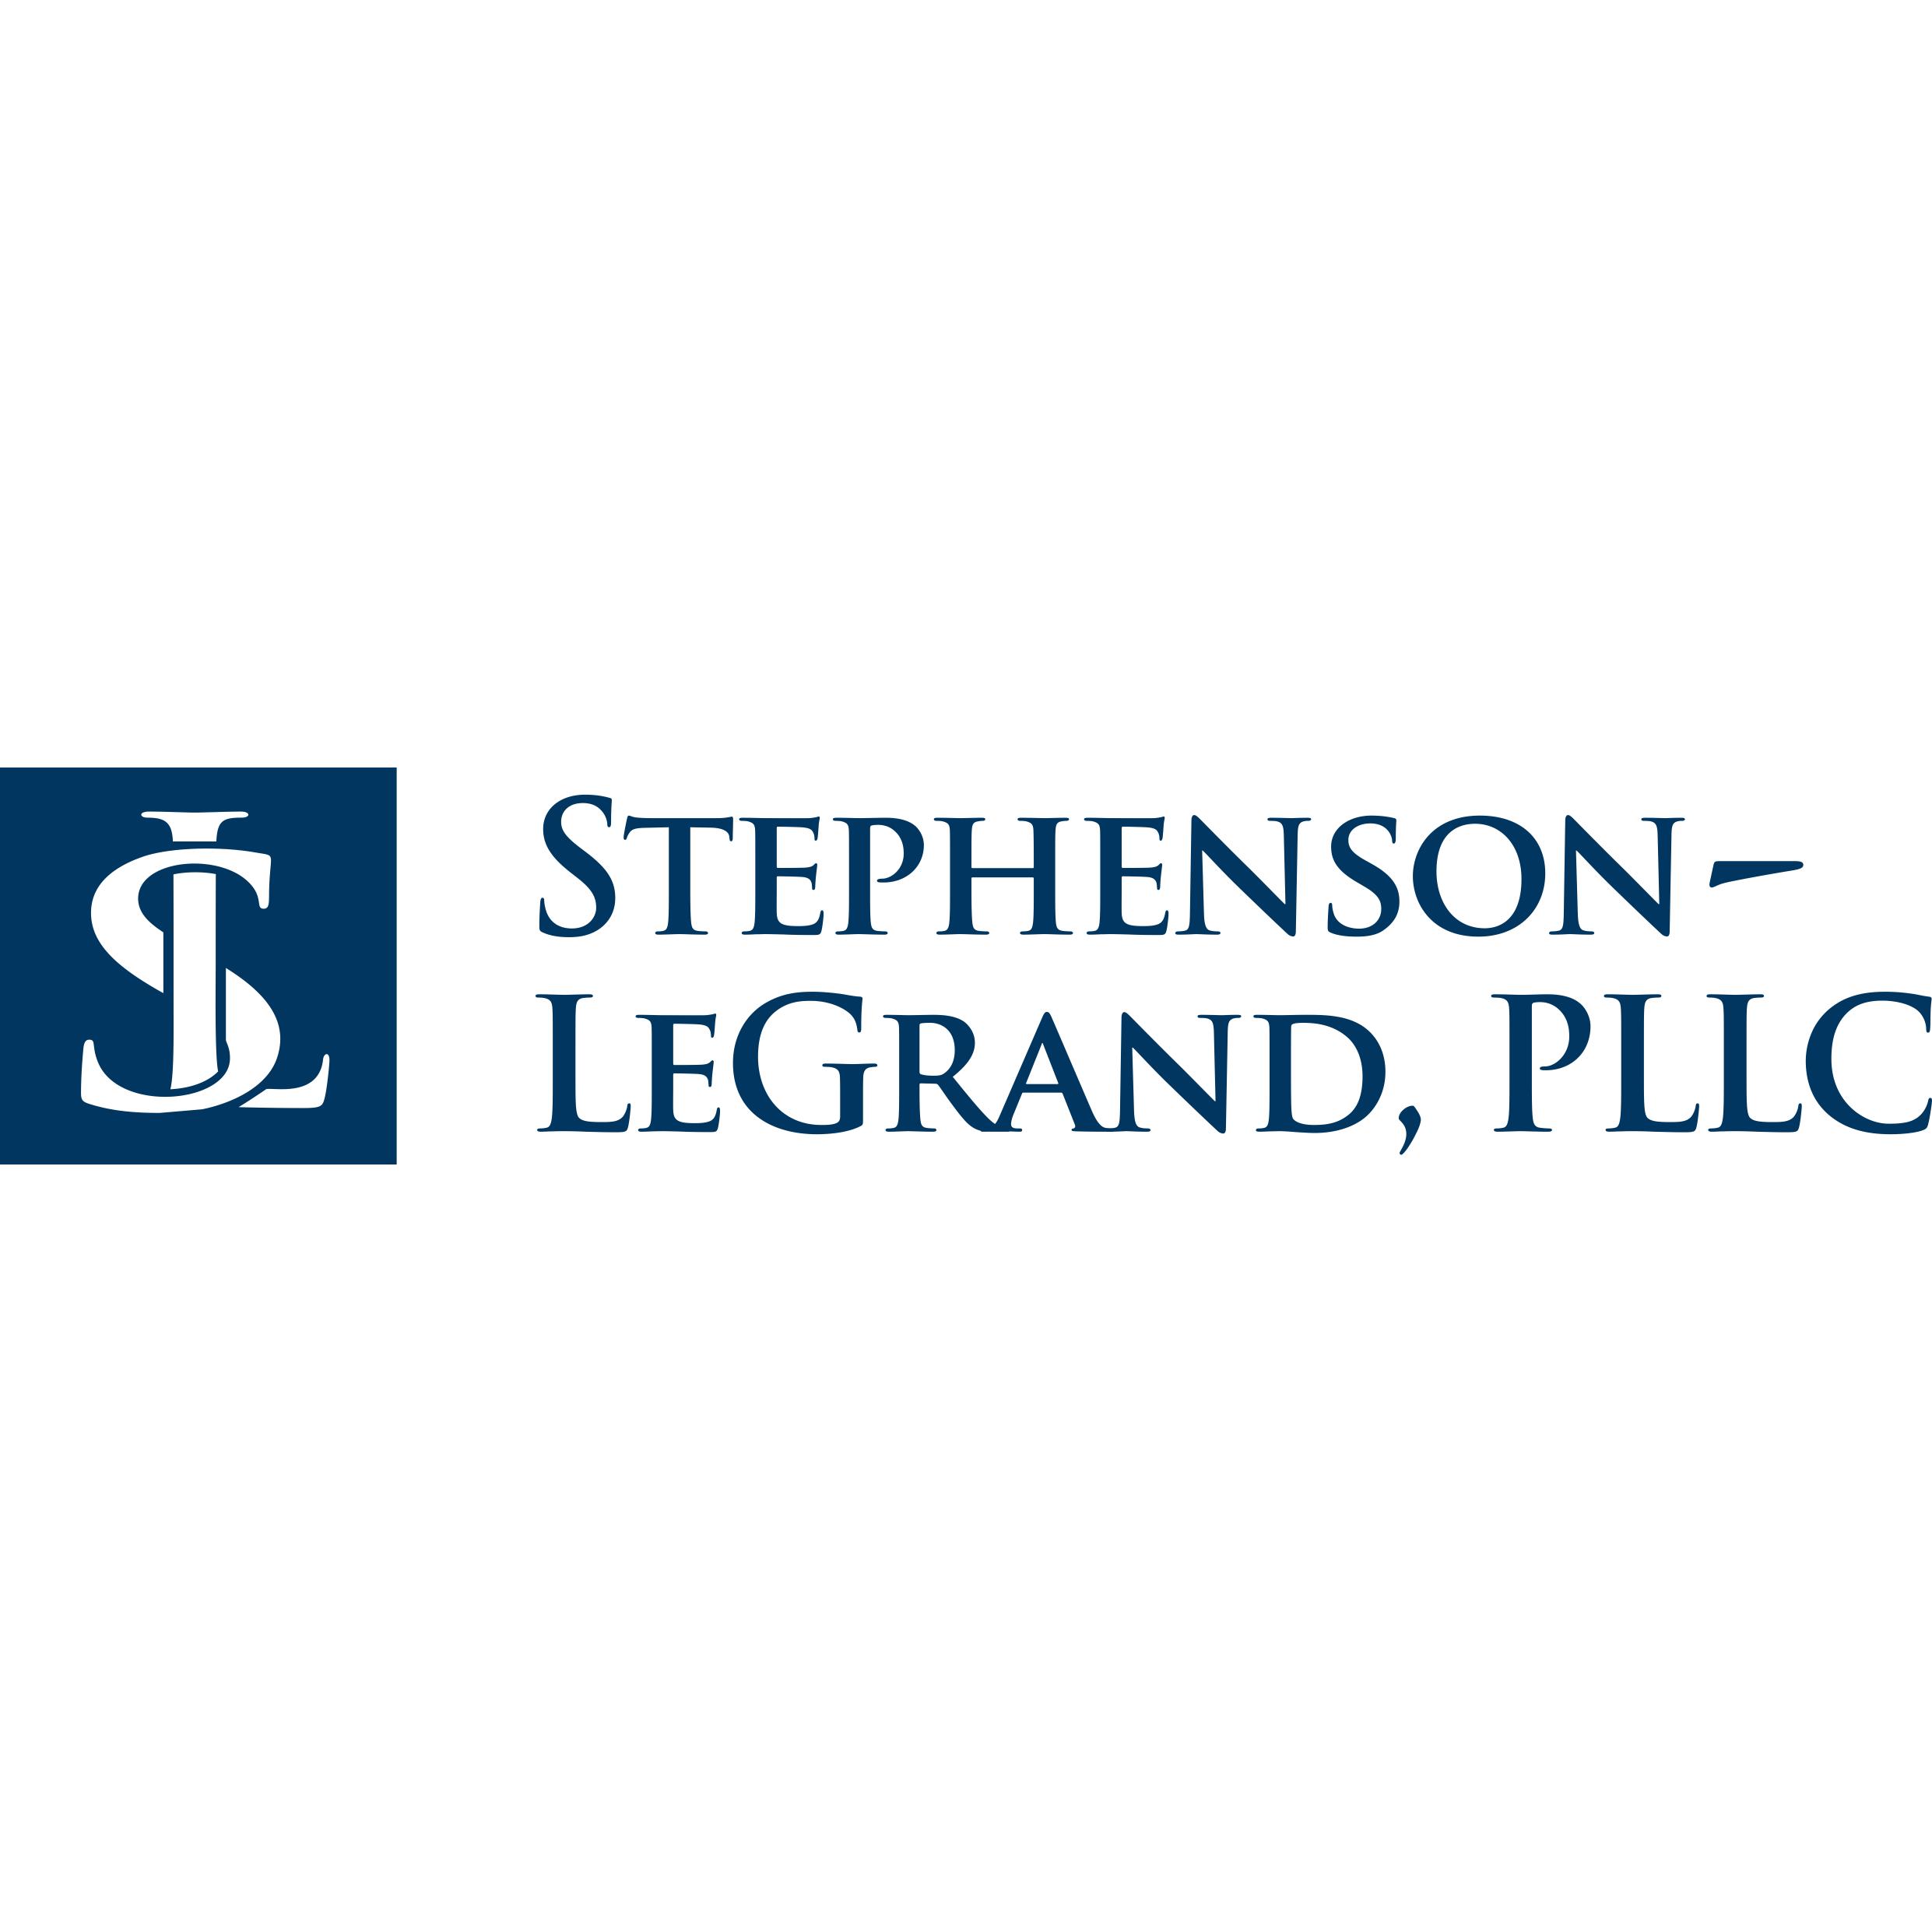 Stephenson-LeGrand, PLLC Accounting Firm - Wharton, TX - Business & Secretarial